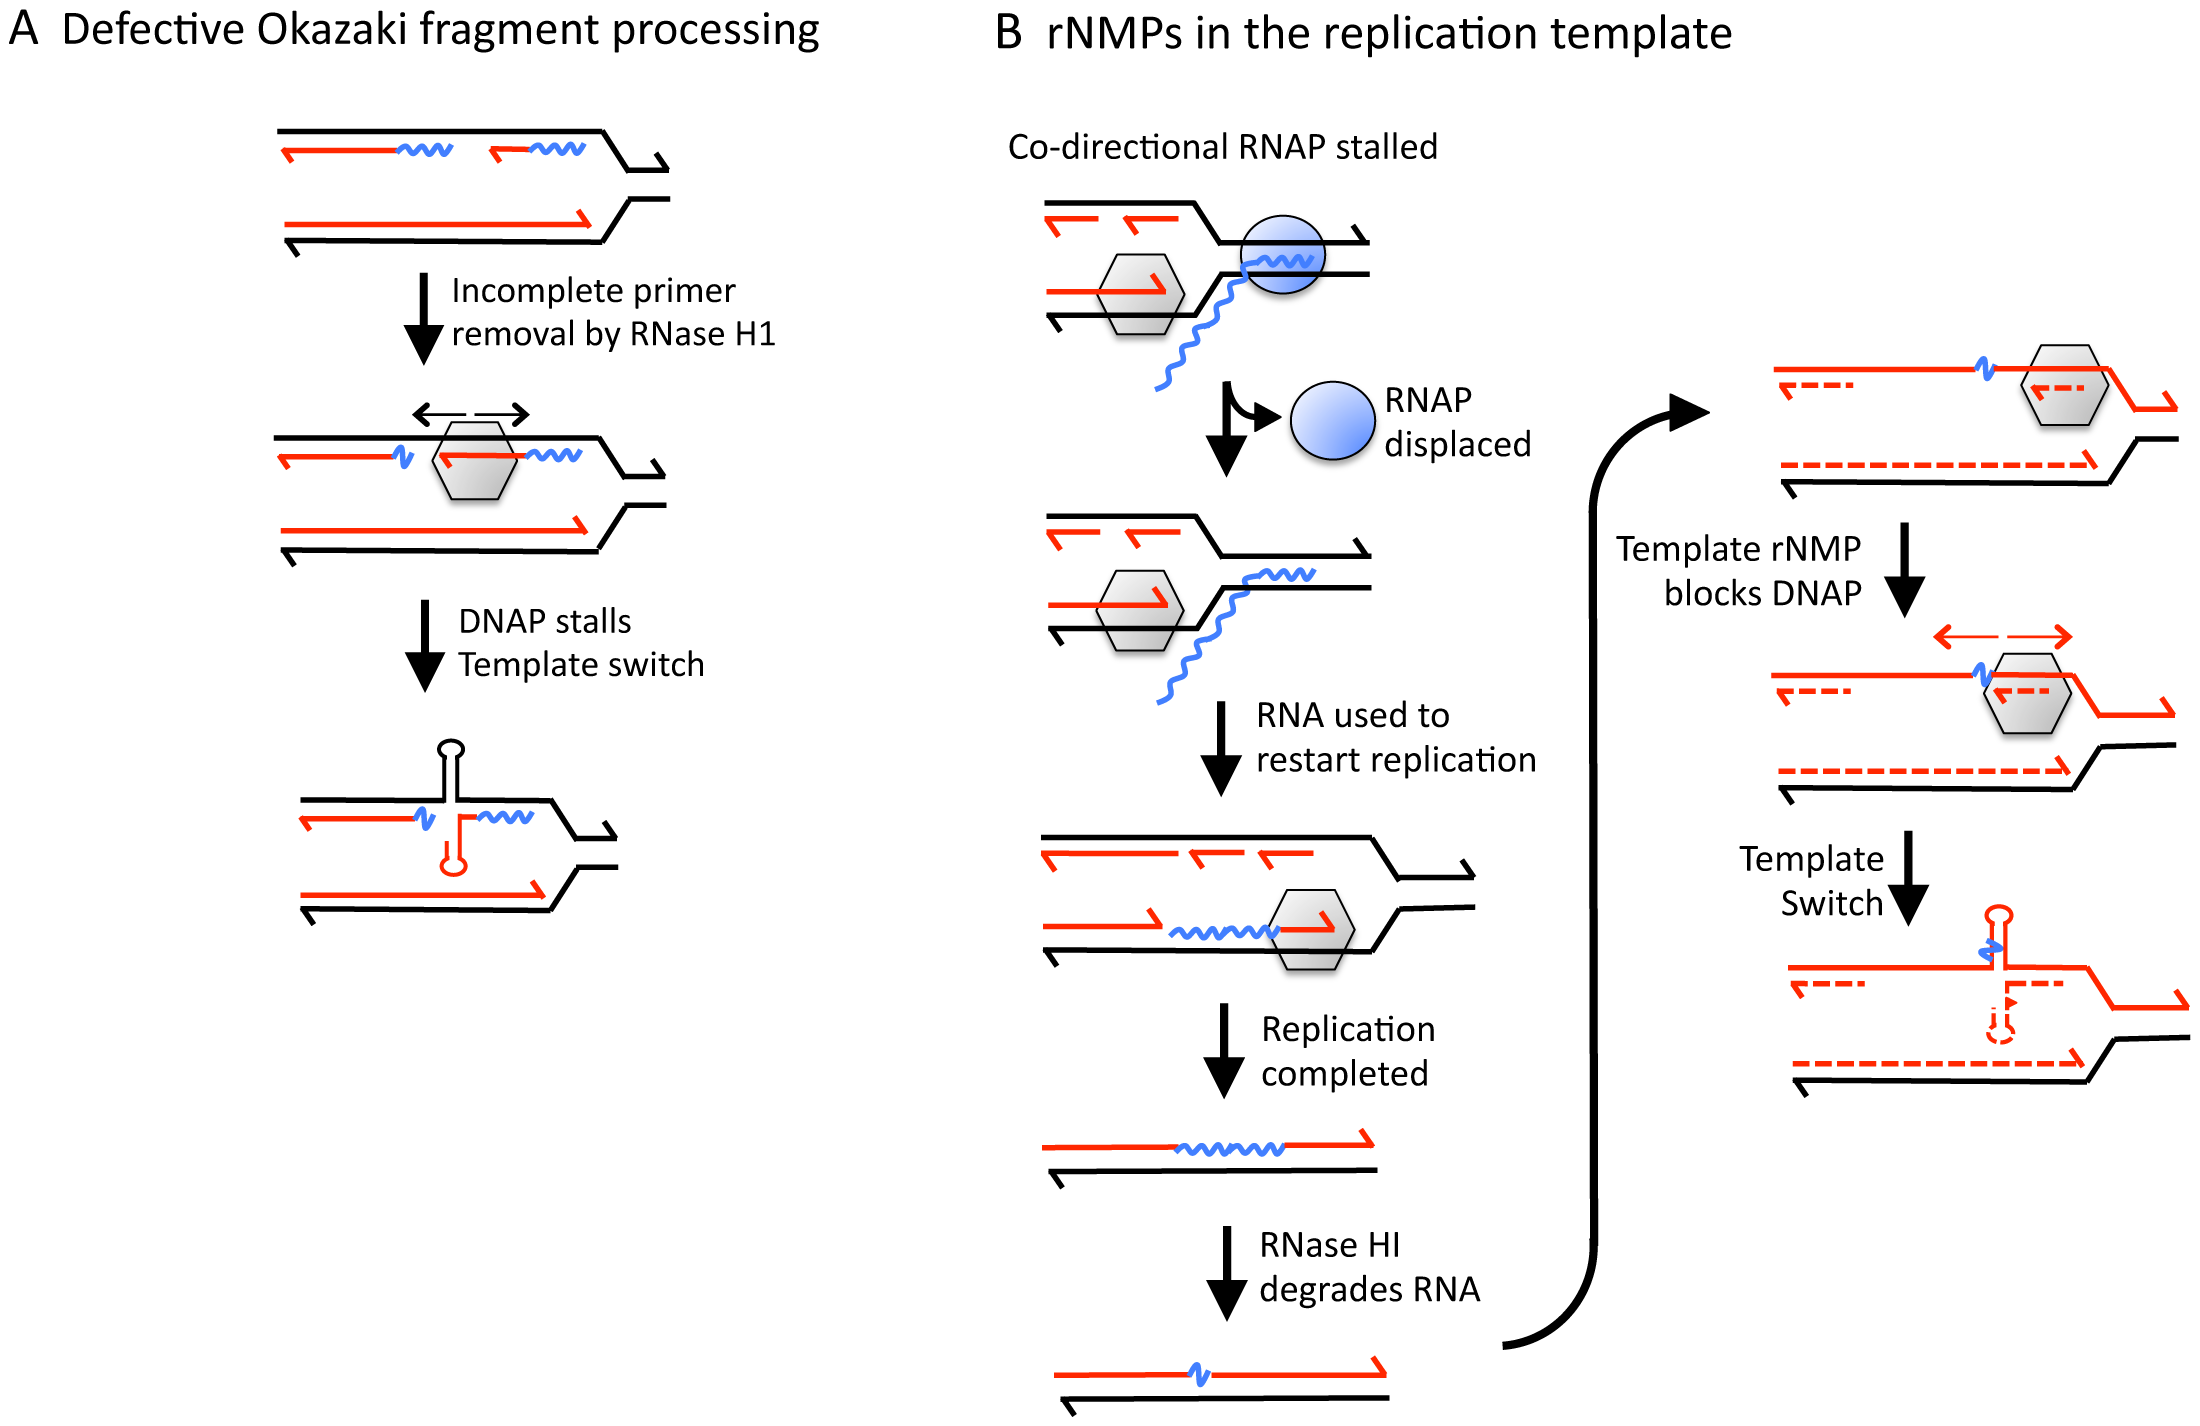 Models for generating rNMP-dependent QP mutations.